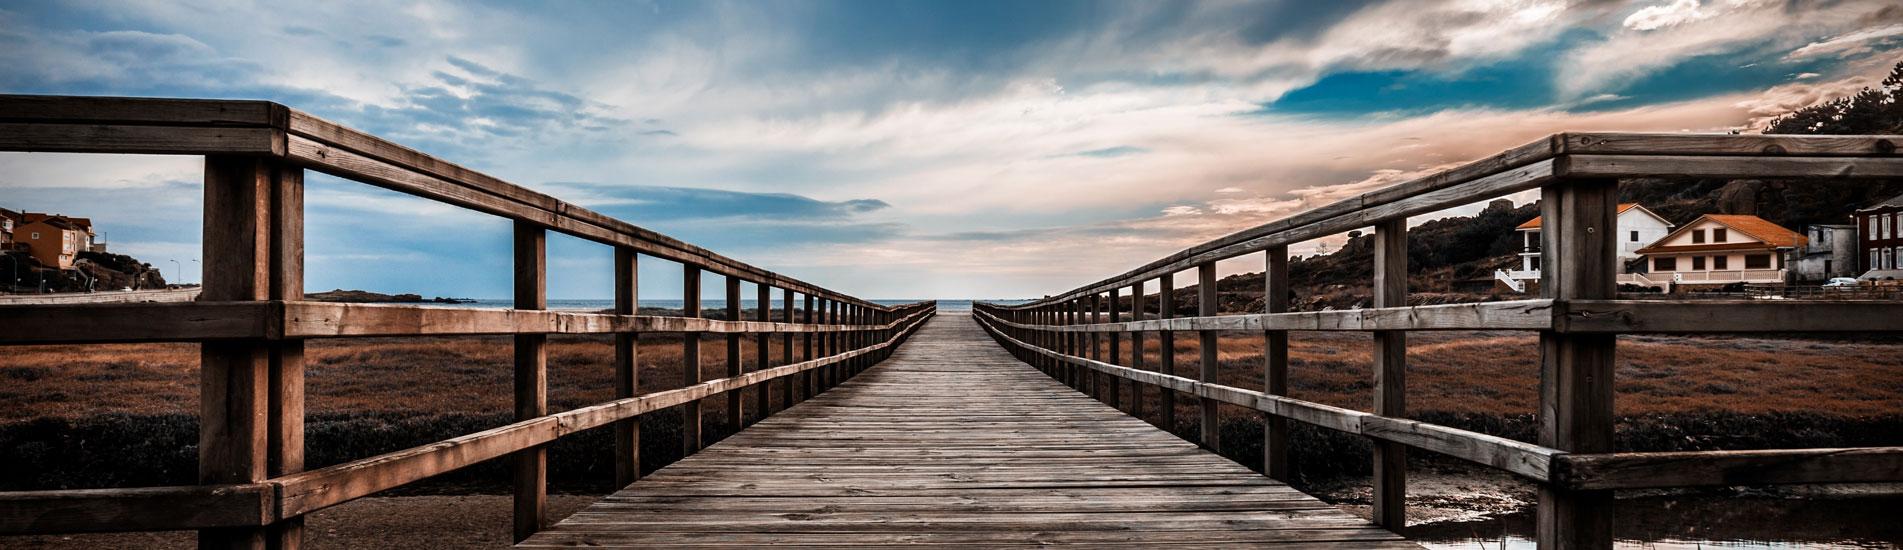 Boardwalk at a beach at sunset